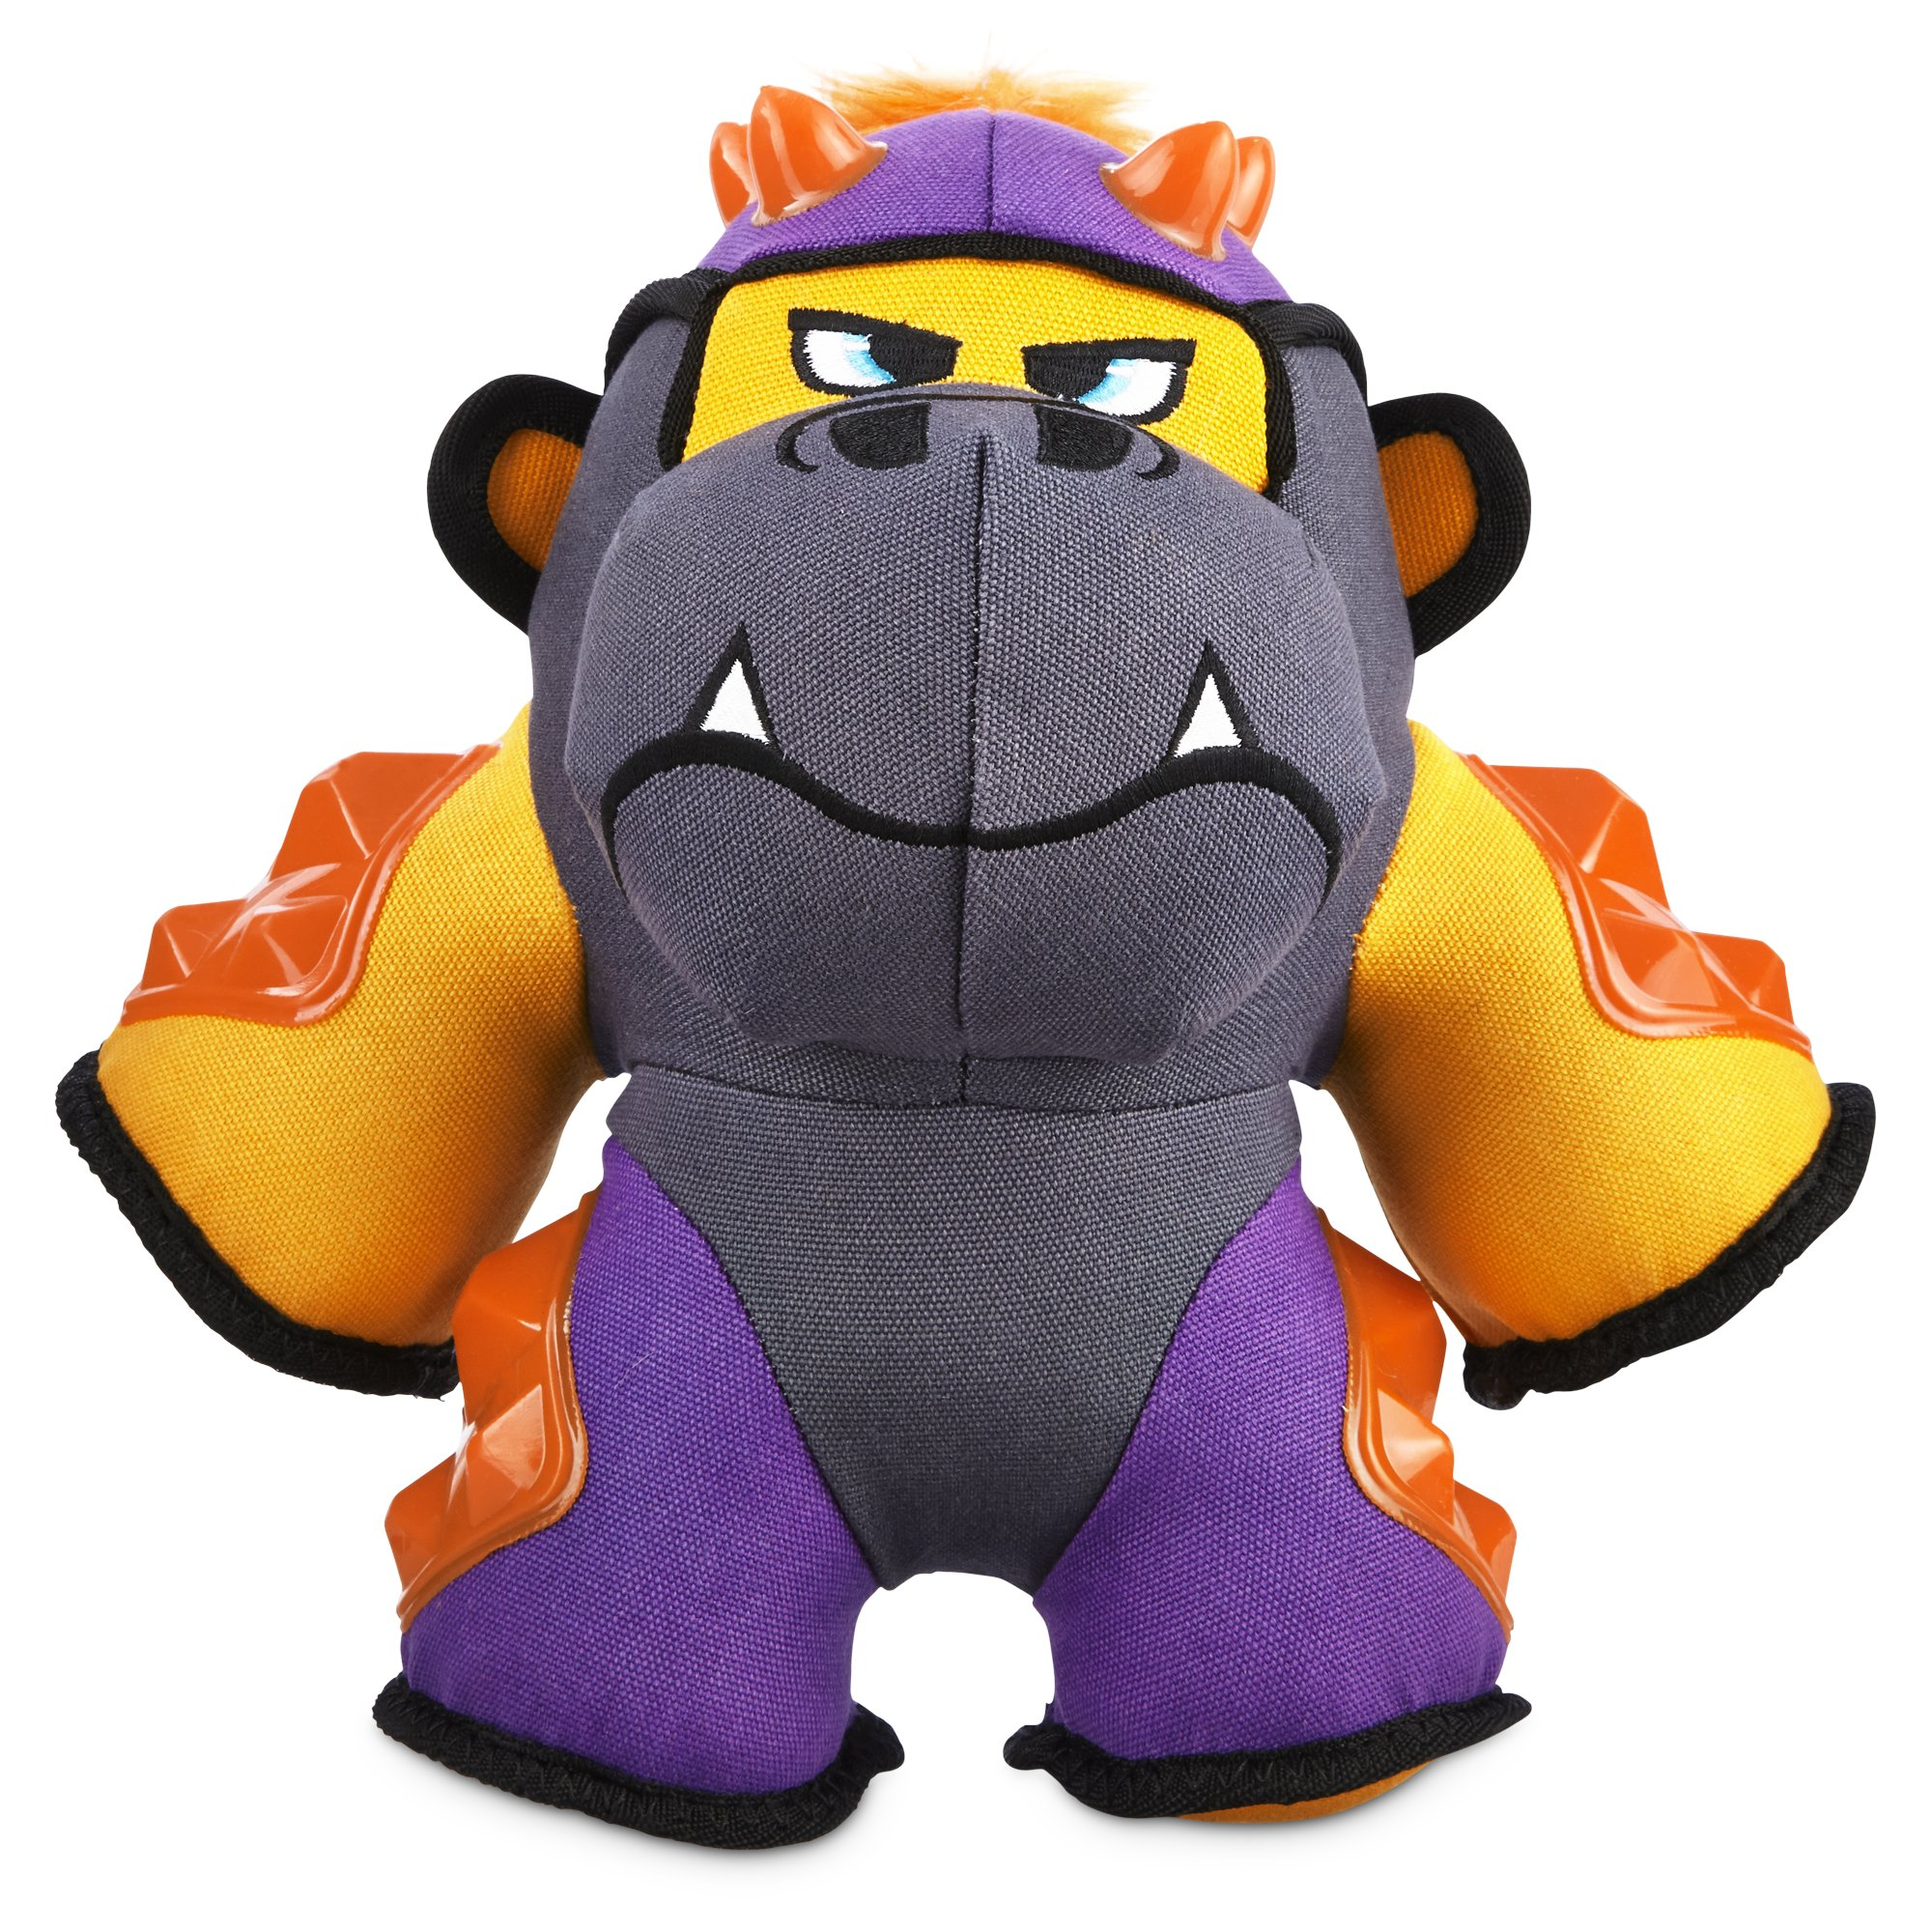 Plush Gorilla Dog Toy